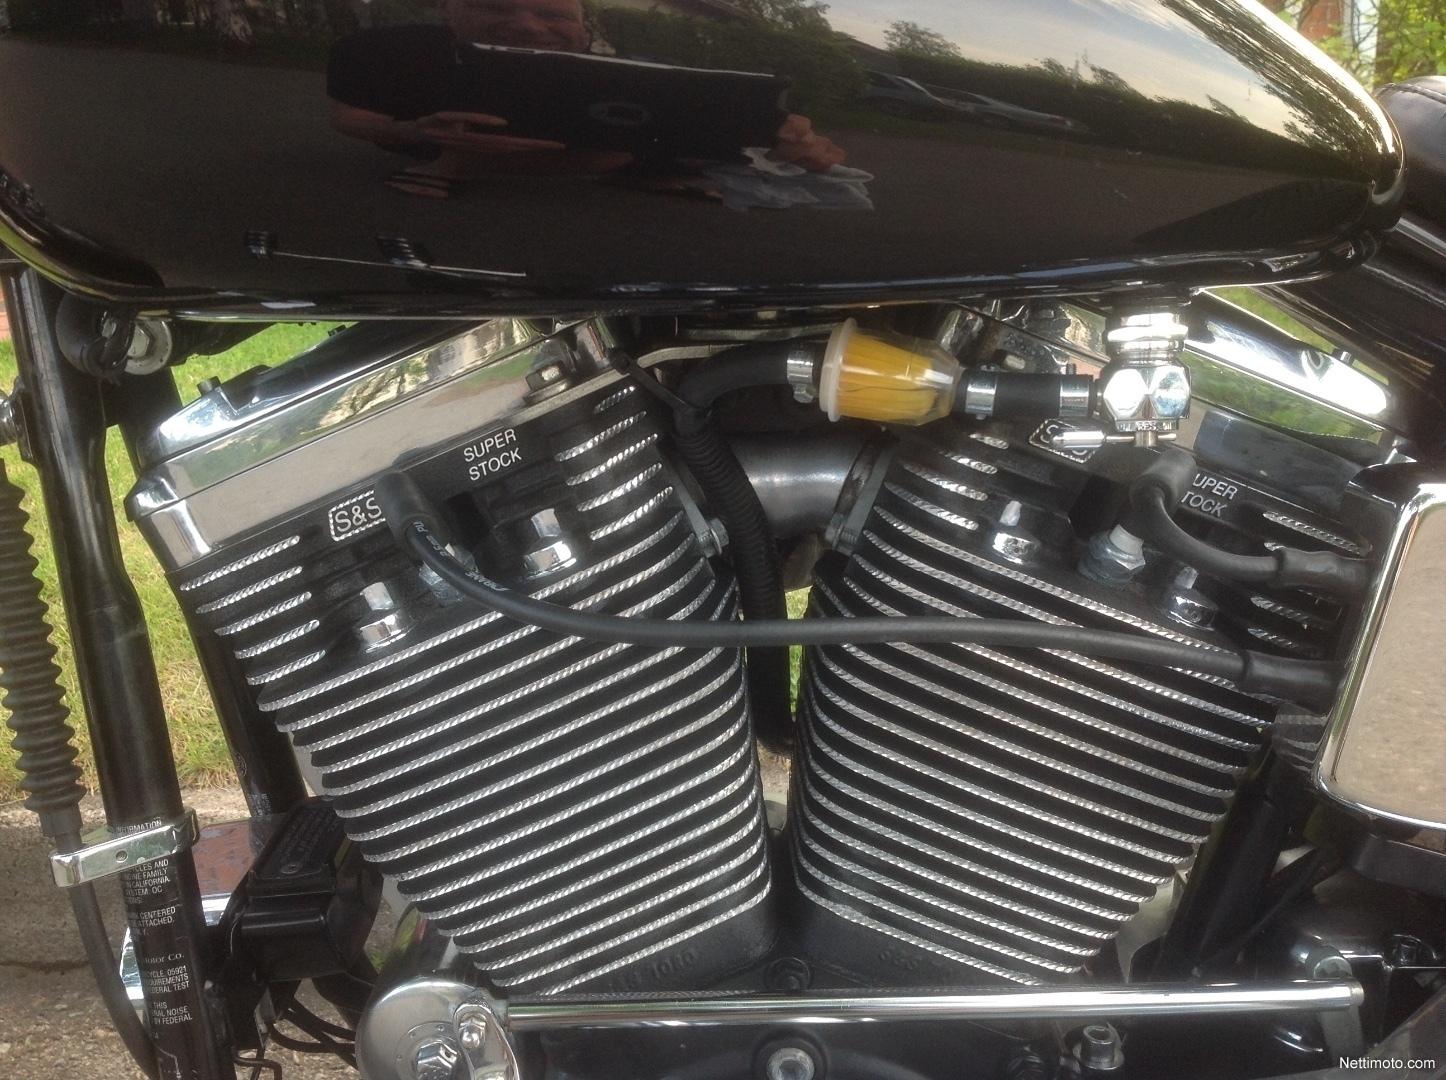 Harley-Davidson Softail * 1 700 cm³ 1979 - Kuopio